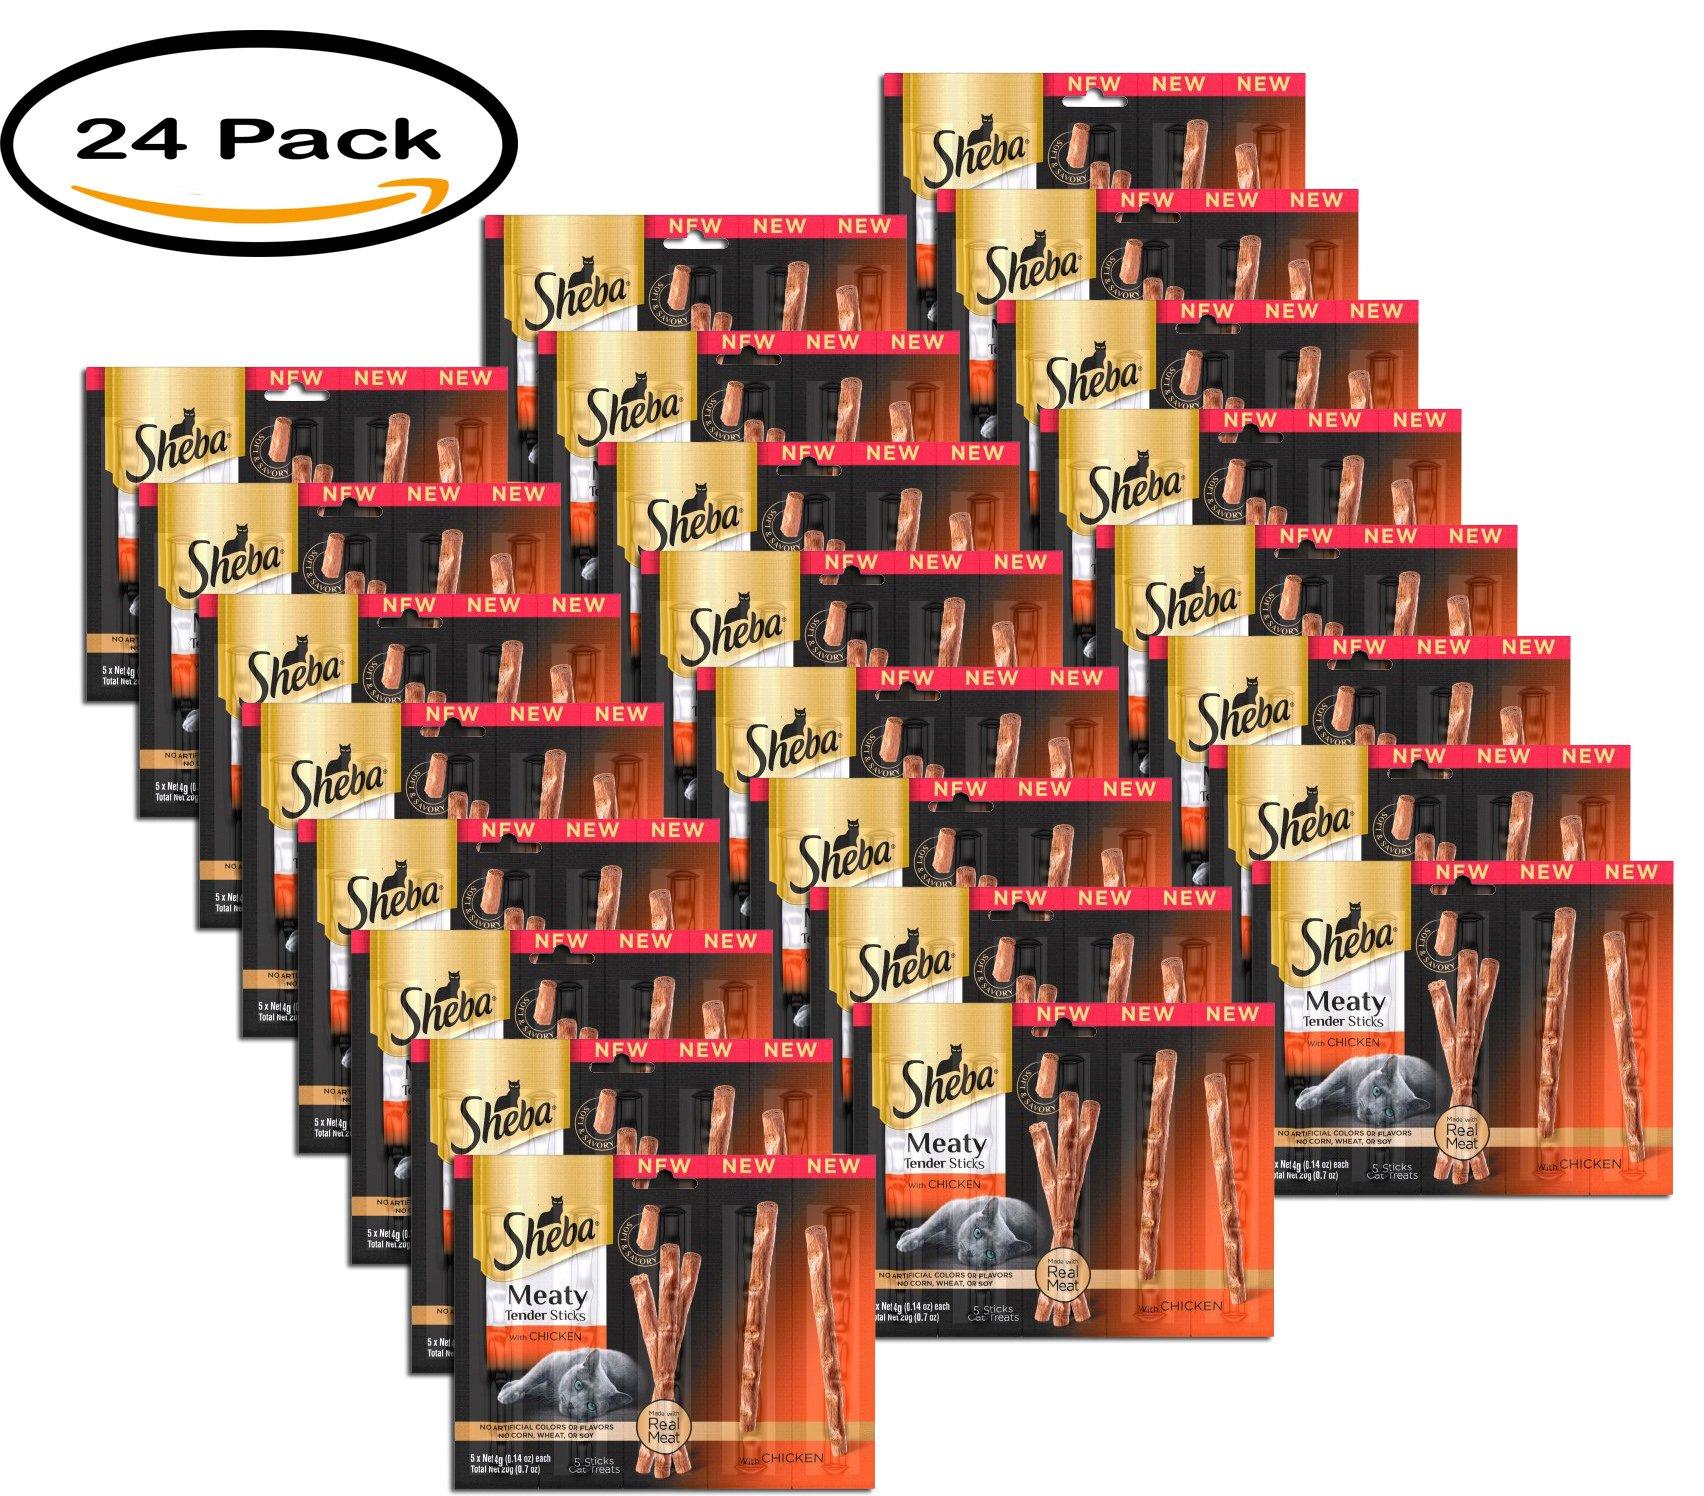 PACK OF 24 -SHEBA Meaty Tender Sticks With Chicken Cat Treats - 0.7 Ounces (5 Treats)